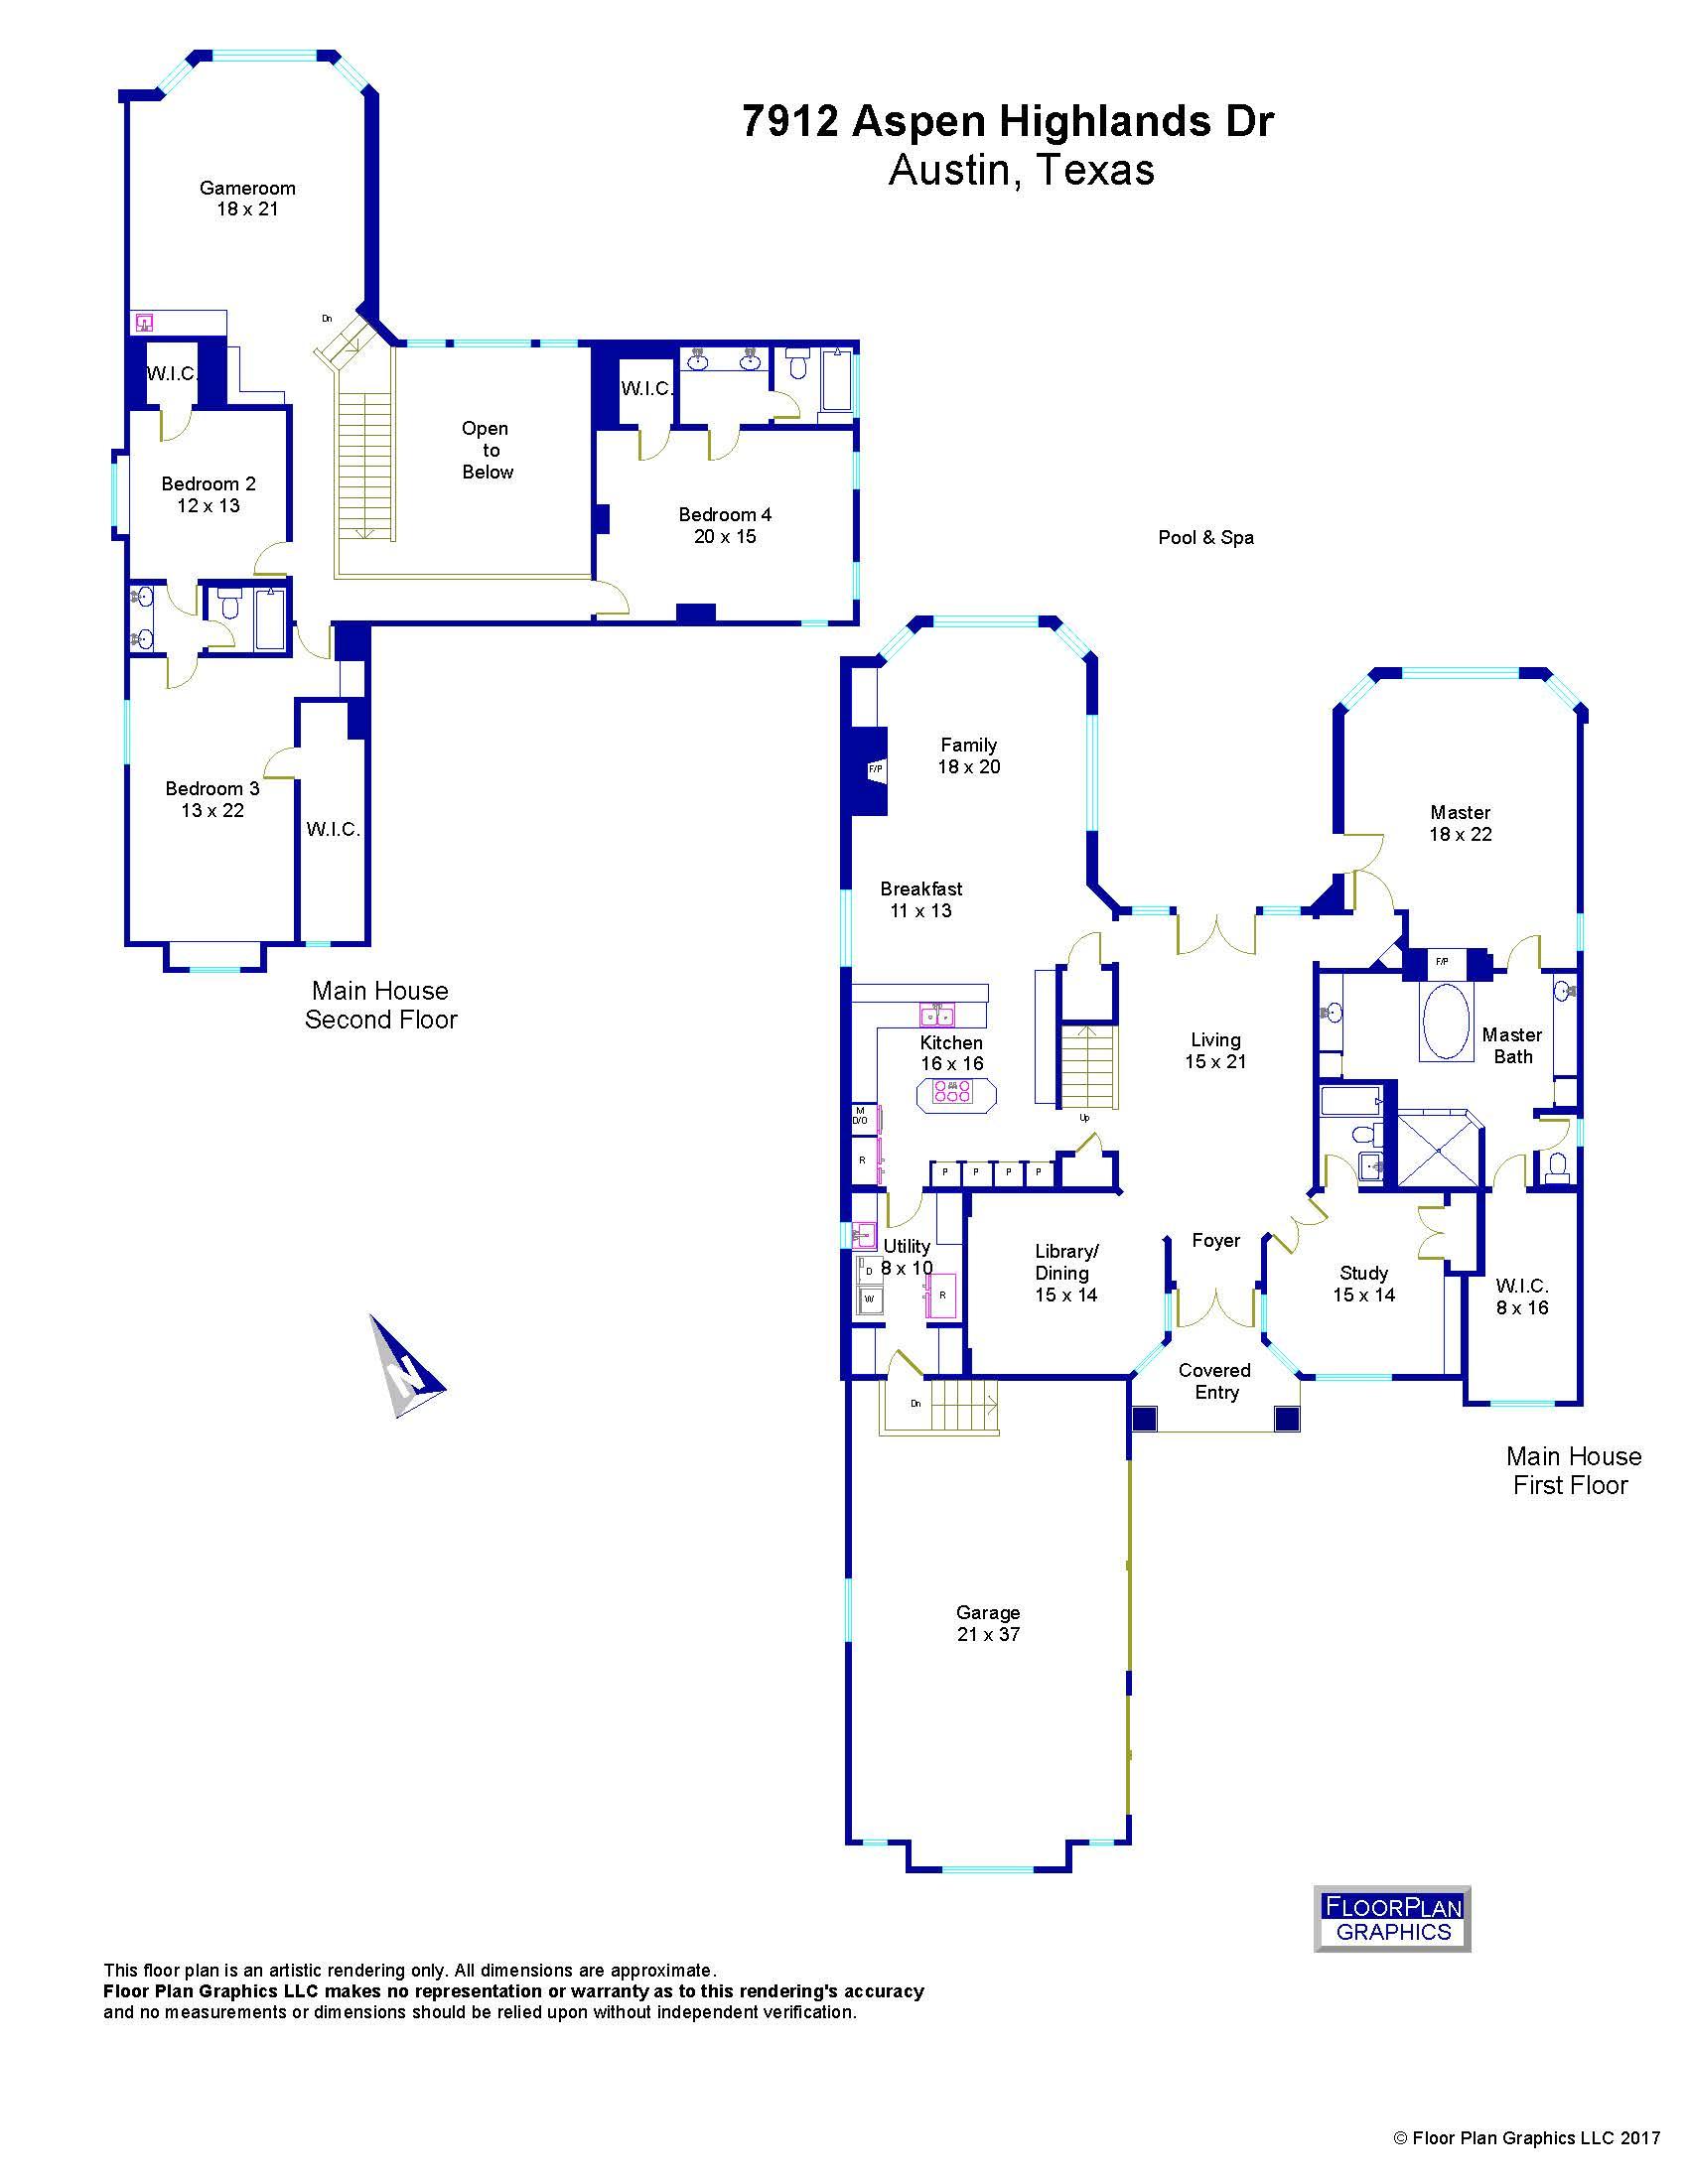 7912 aspen highlands dr floor plan survey